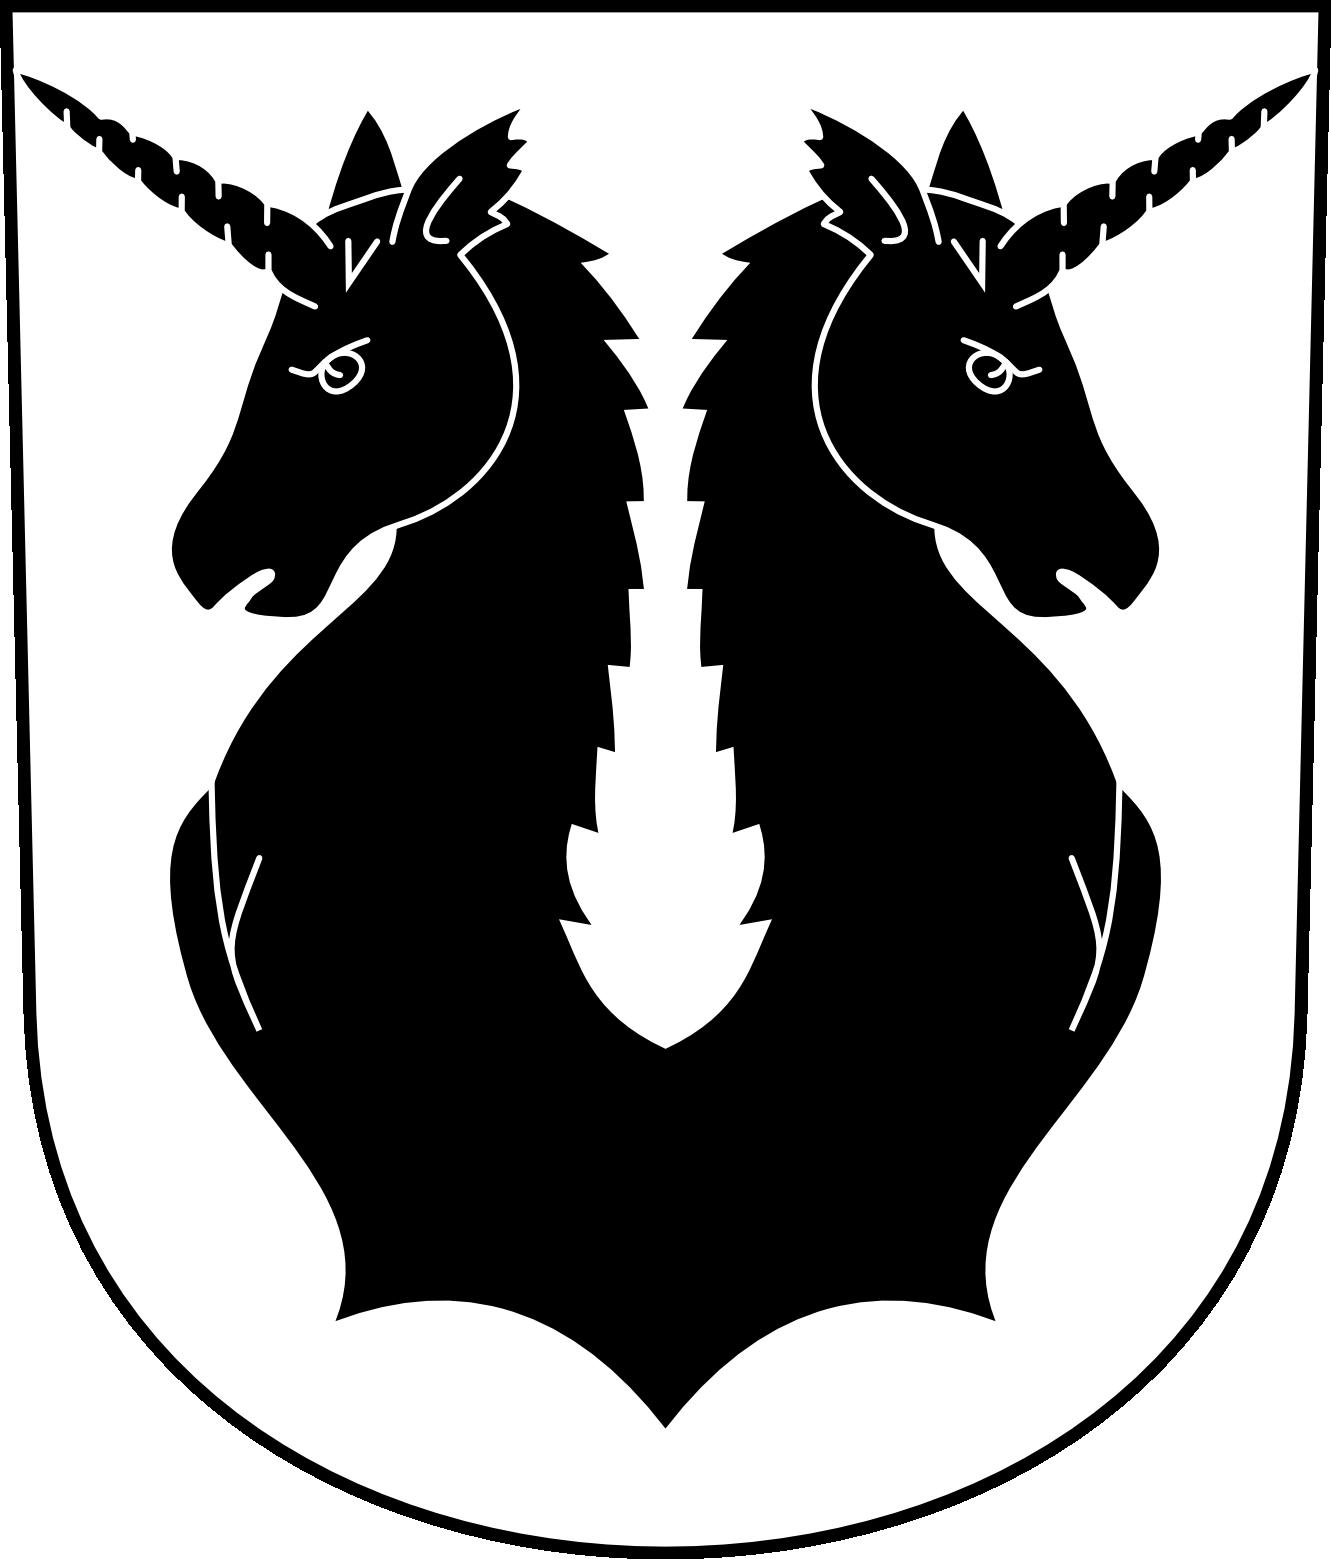 unicorn clipart black and white - photo #36